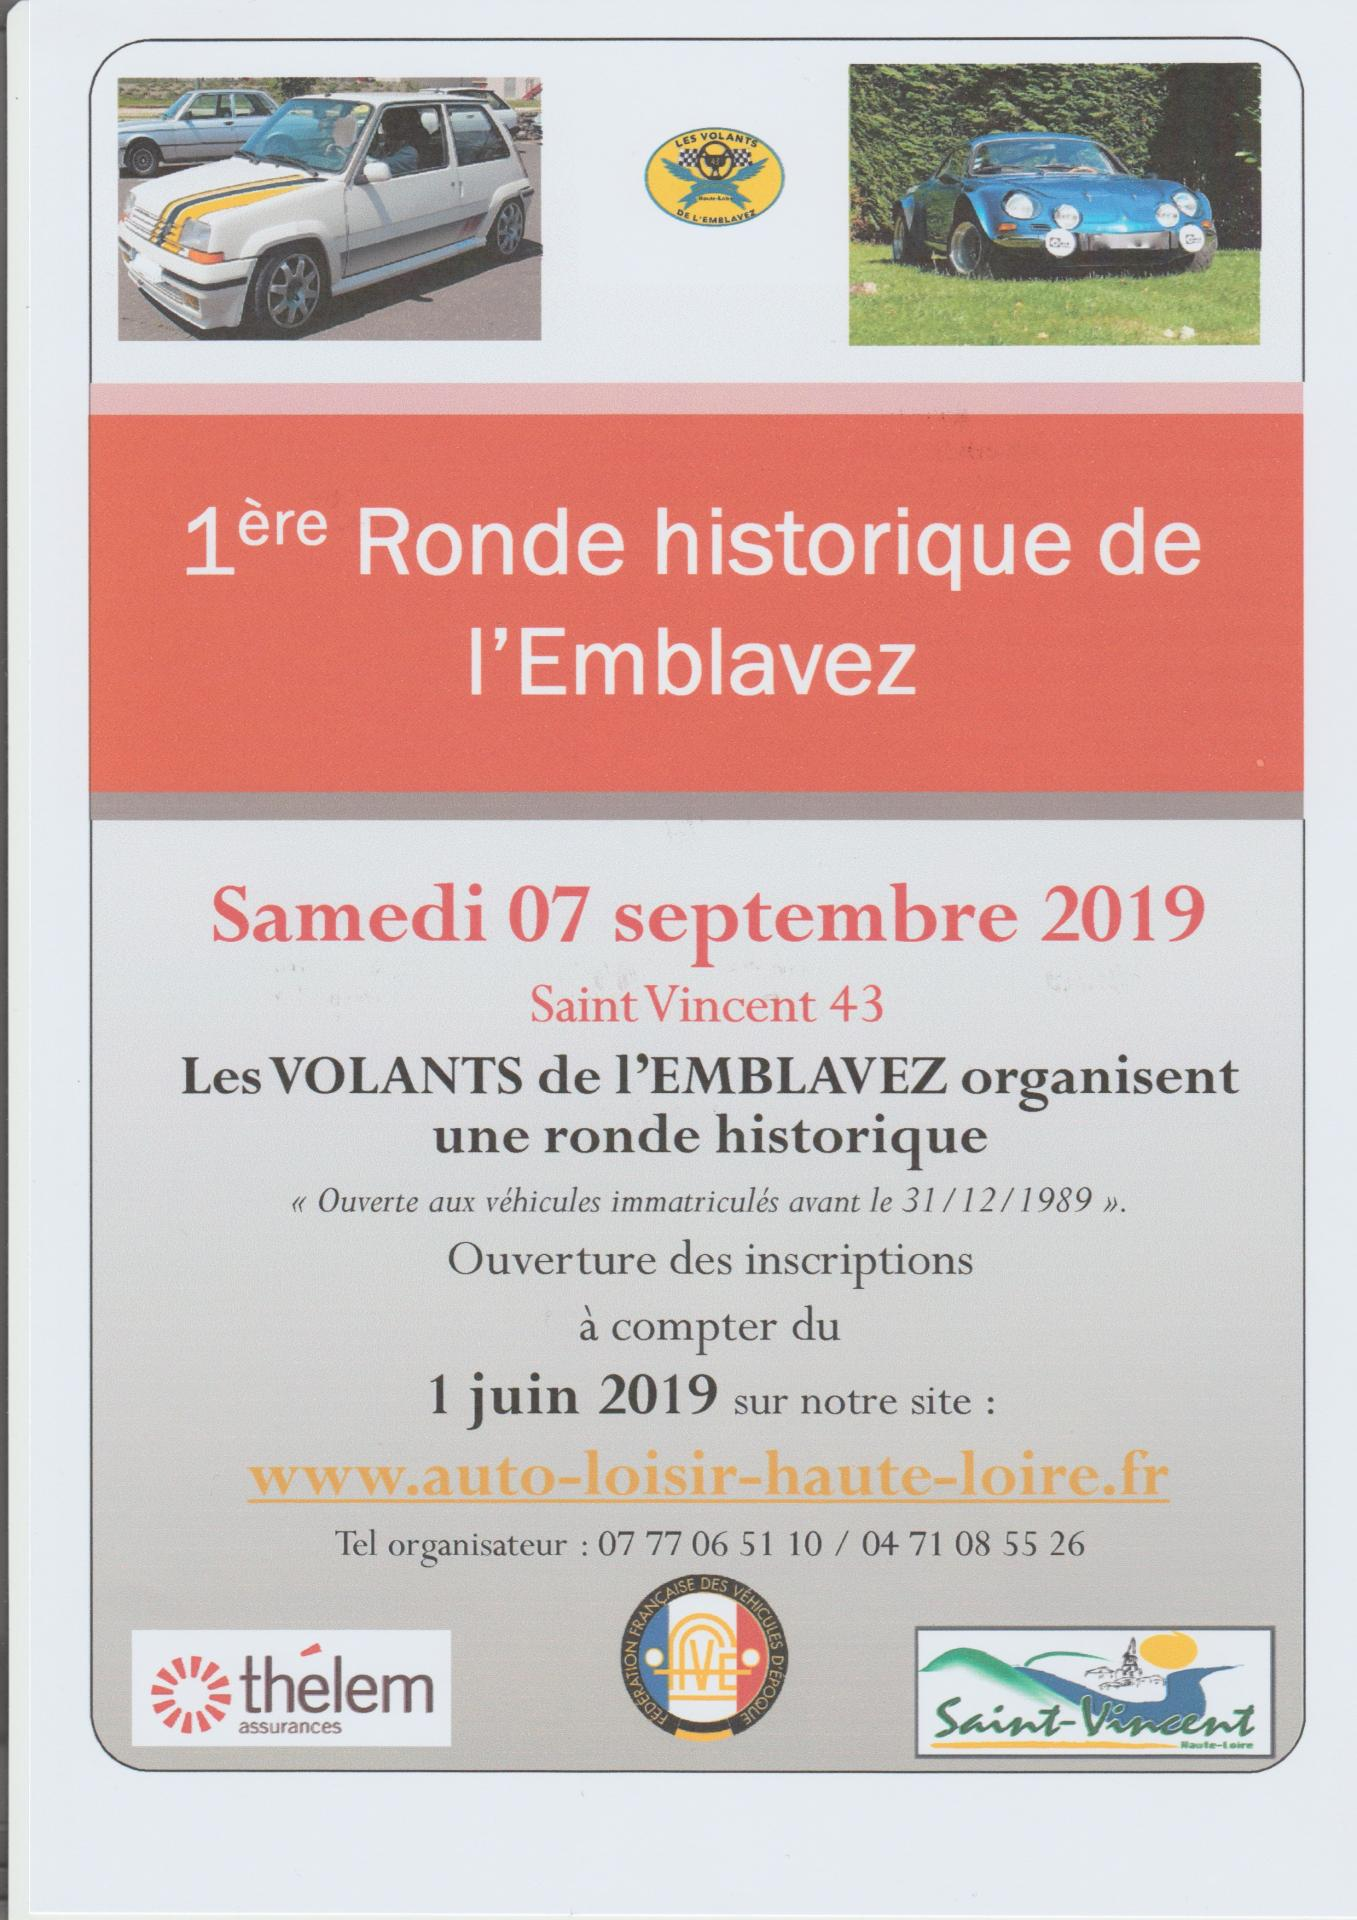 1ére ronde historique de l'emblavez samedi 07 septembre 2019